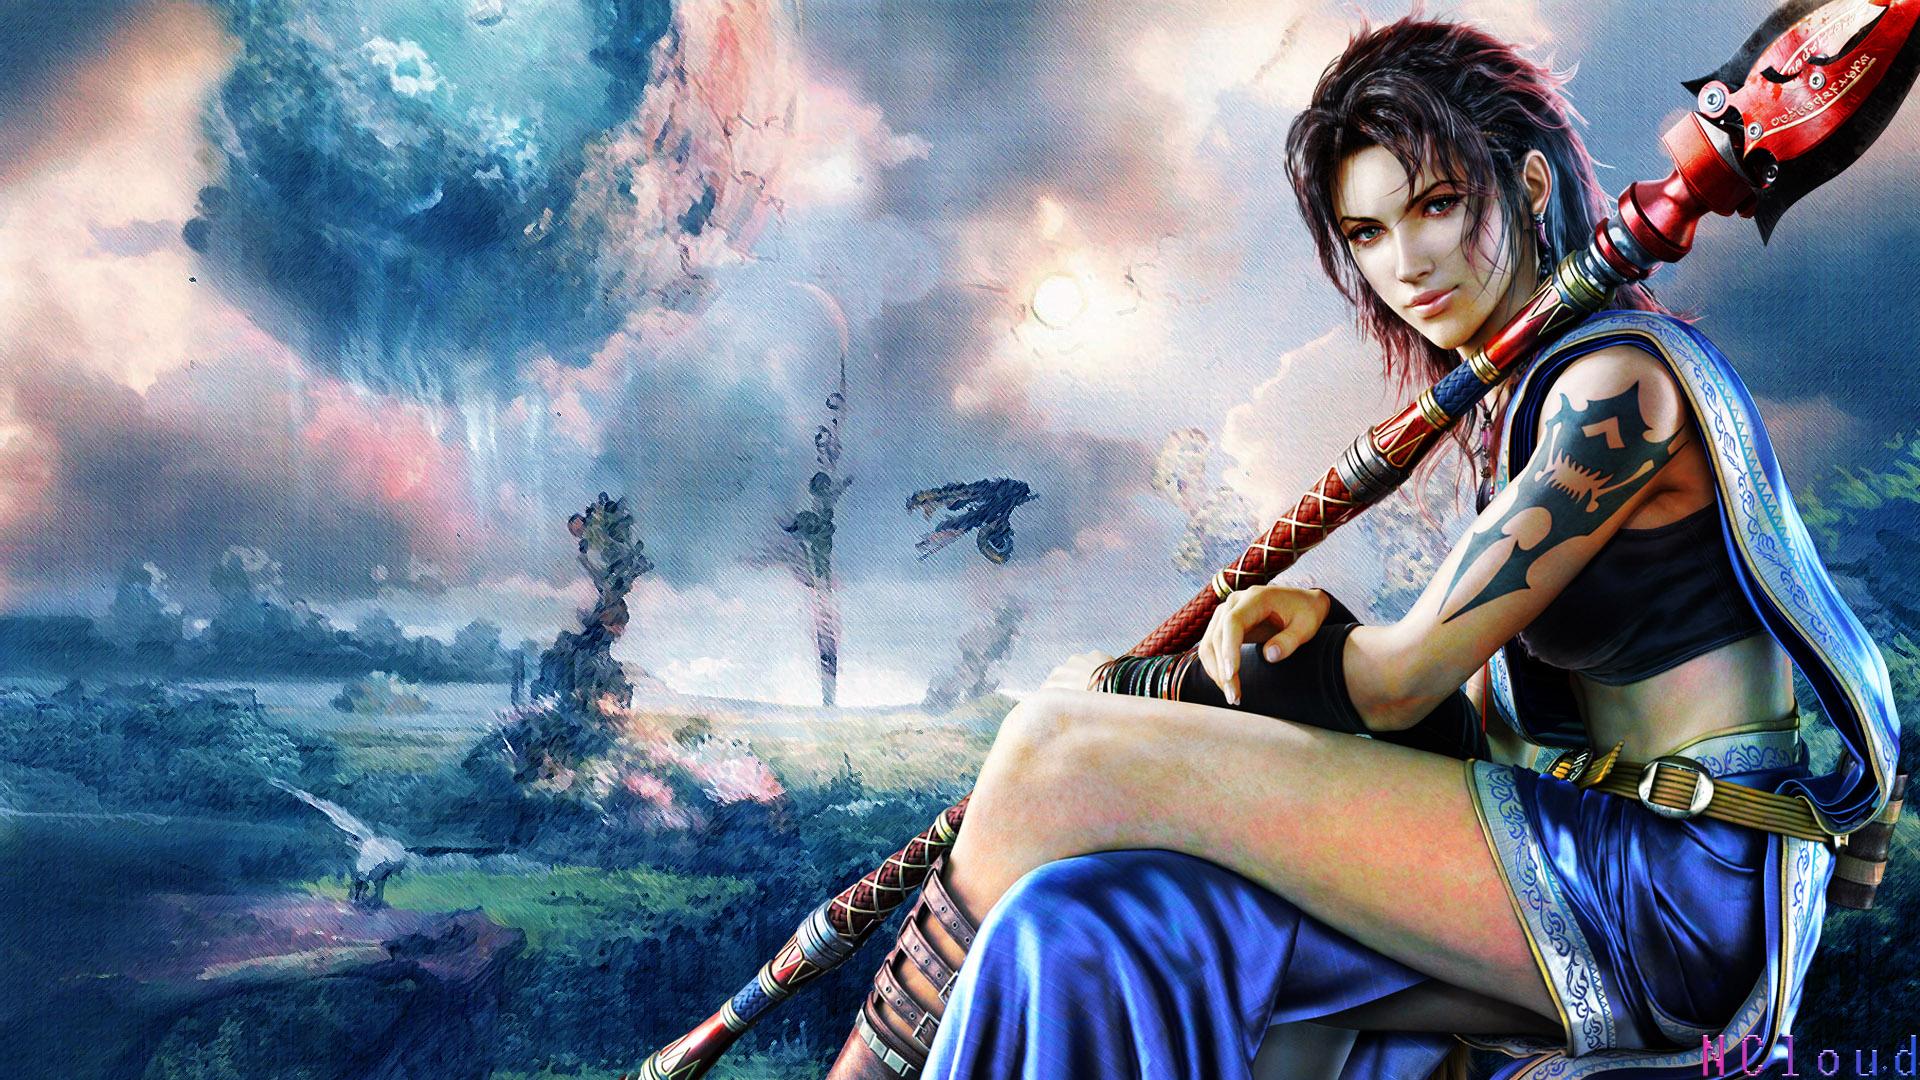 Final Fantasy Game Wallpaper HD wallpapers   Final Fantasy Game 1920x1080